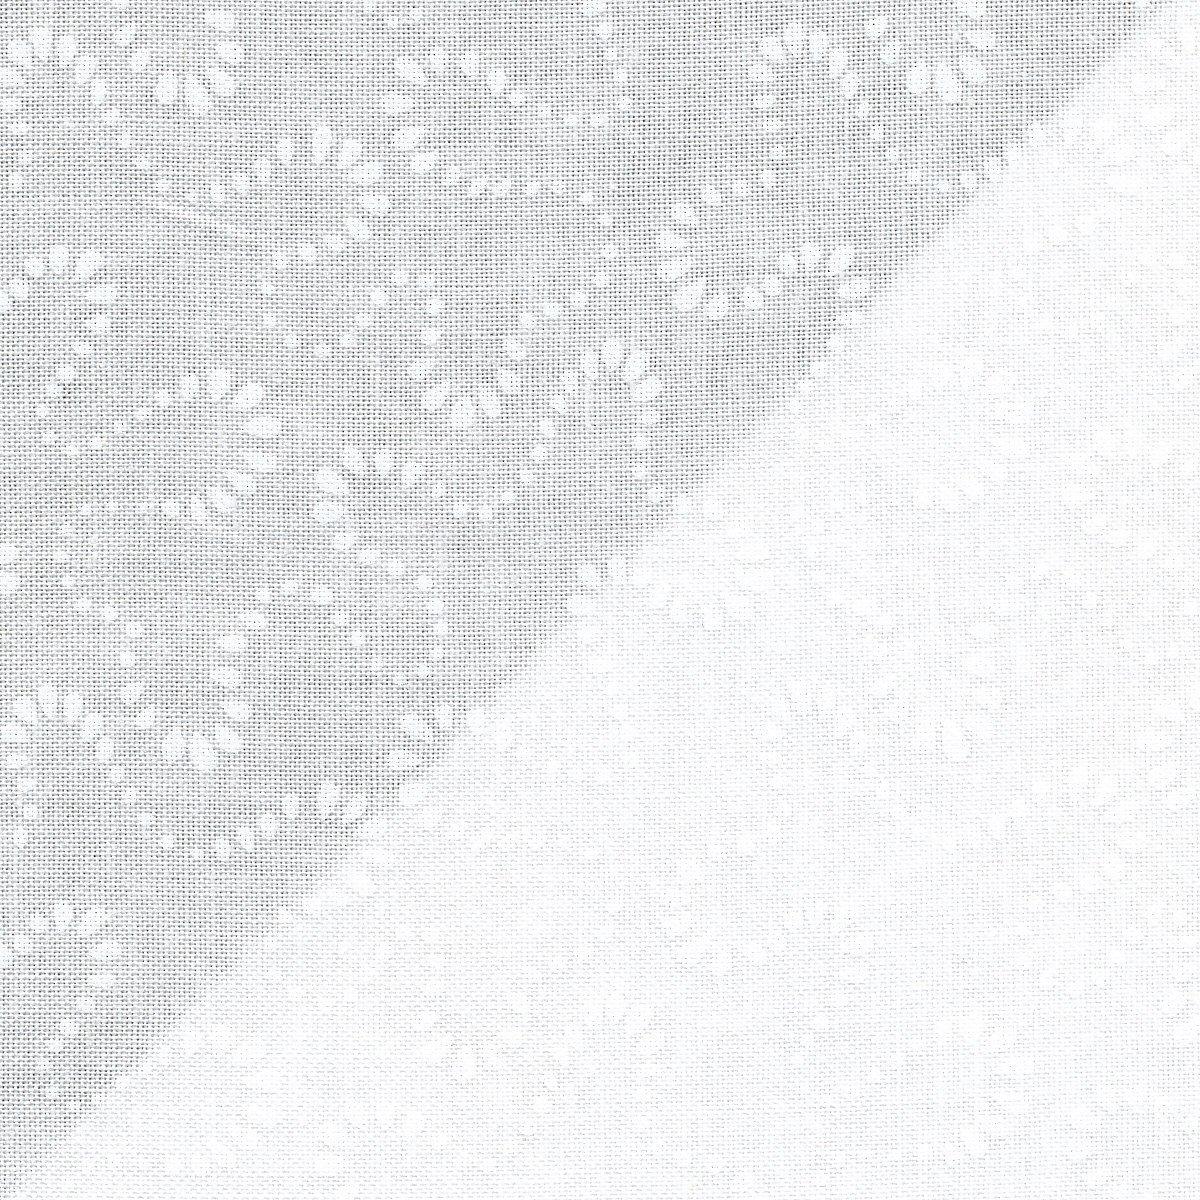 Solitaire Whites - MAS206-UW